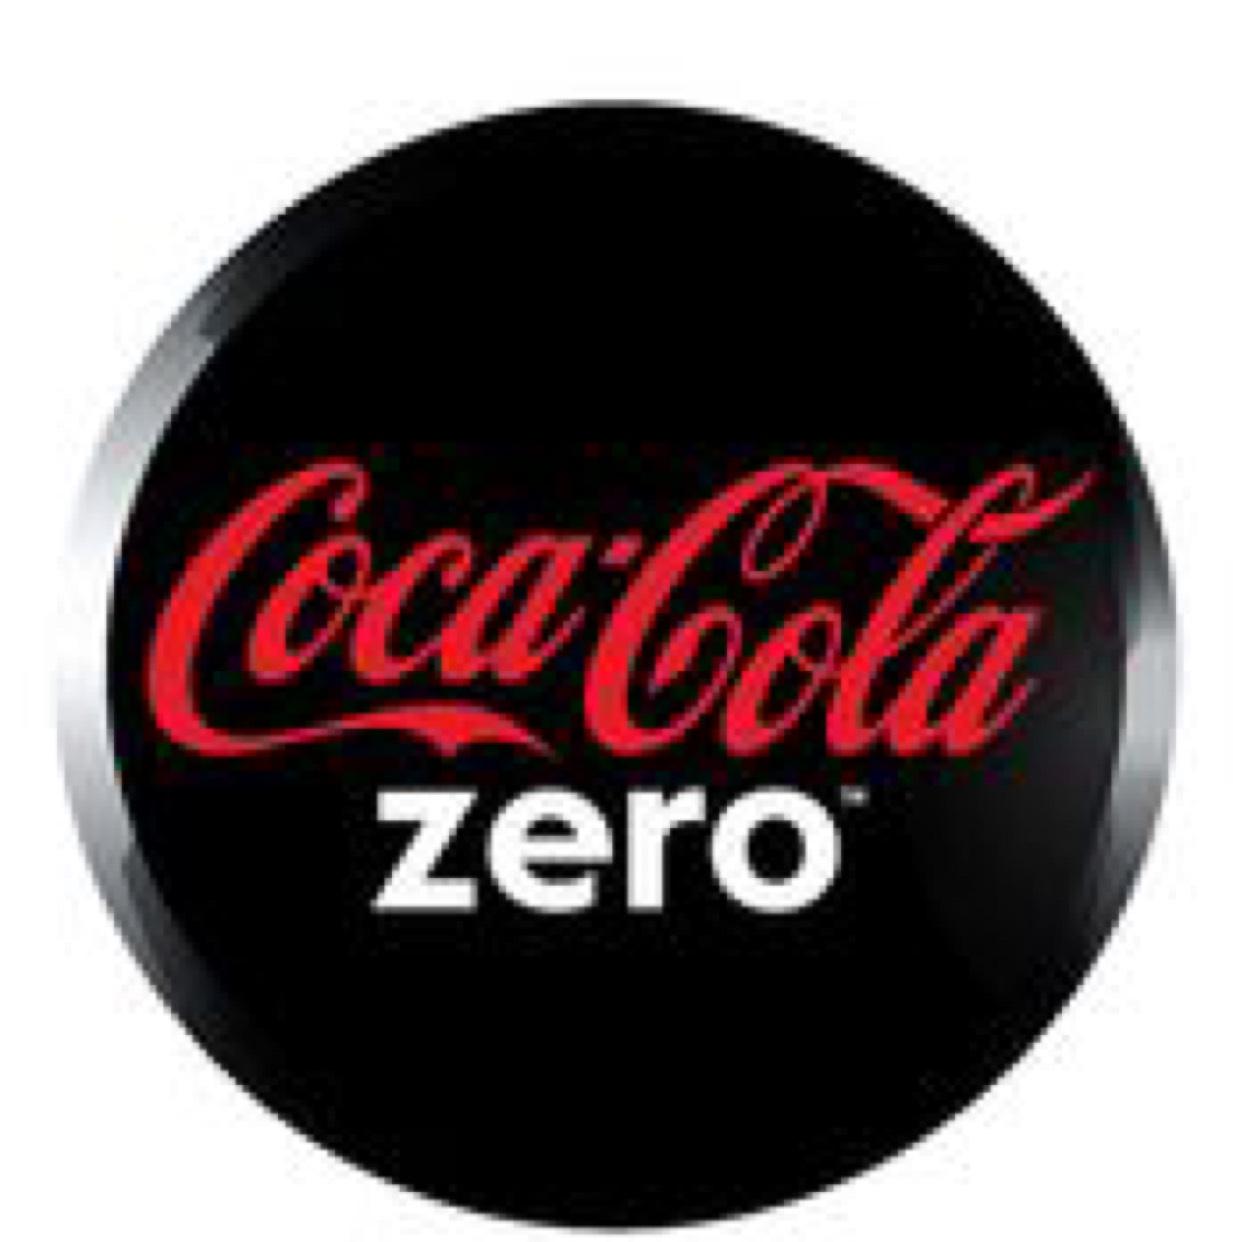 25% off all Coca Cola Zero products @ Amazon Pantry